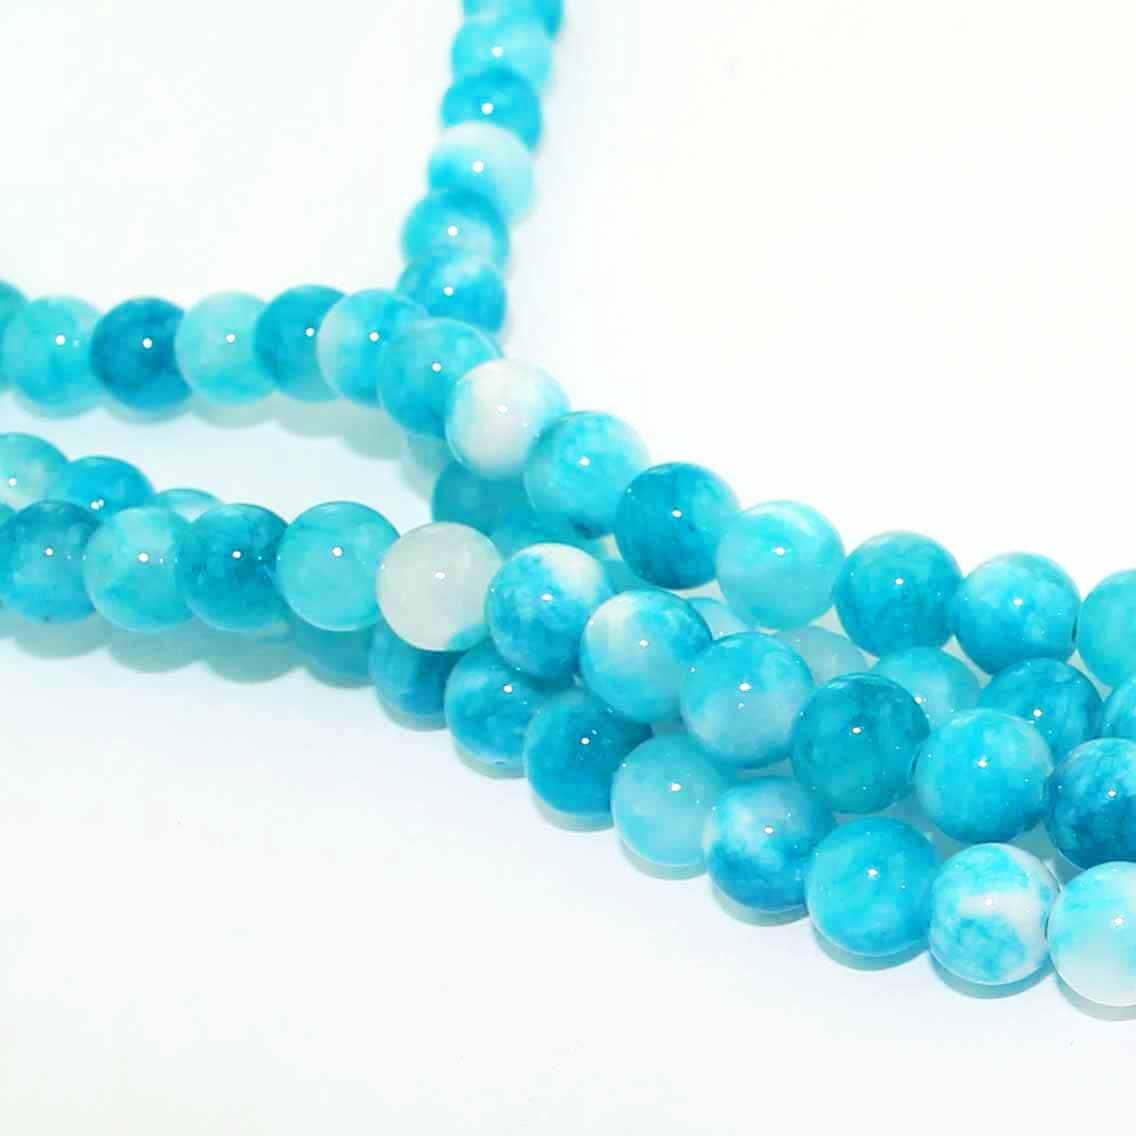 Tones of Atlantic Seashore BD120 15 Mottled Glass Beads 10mm